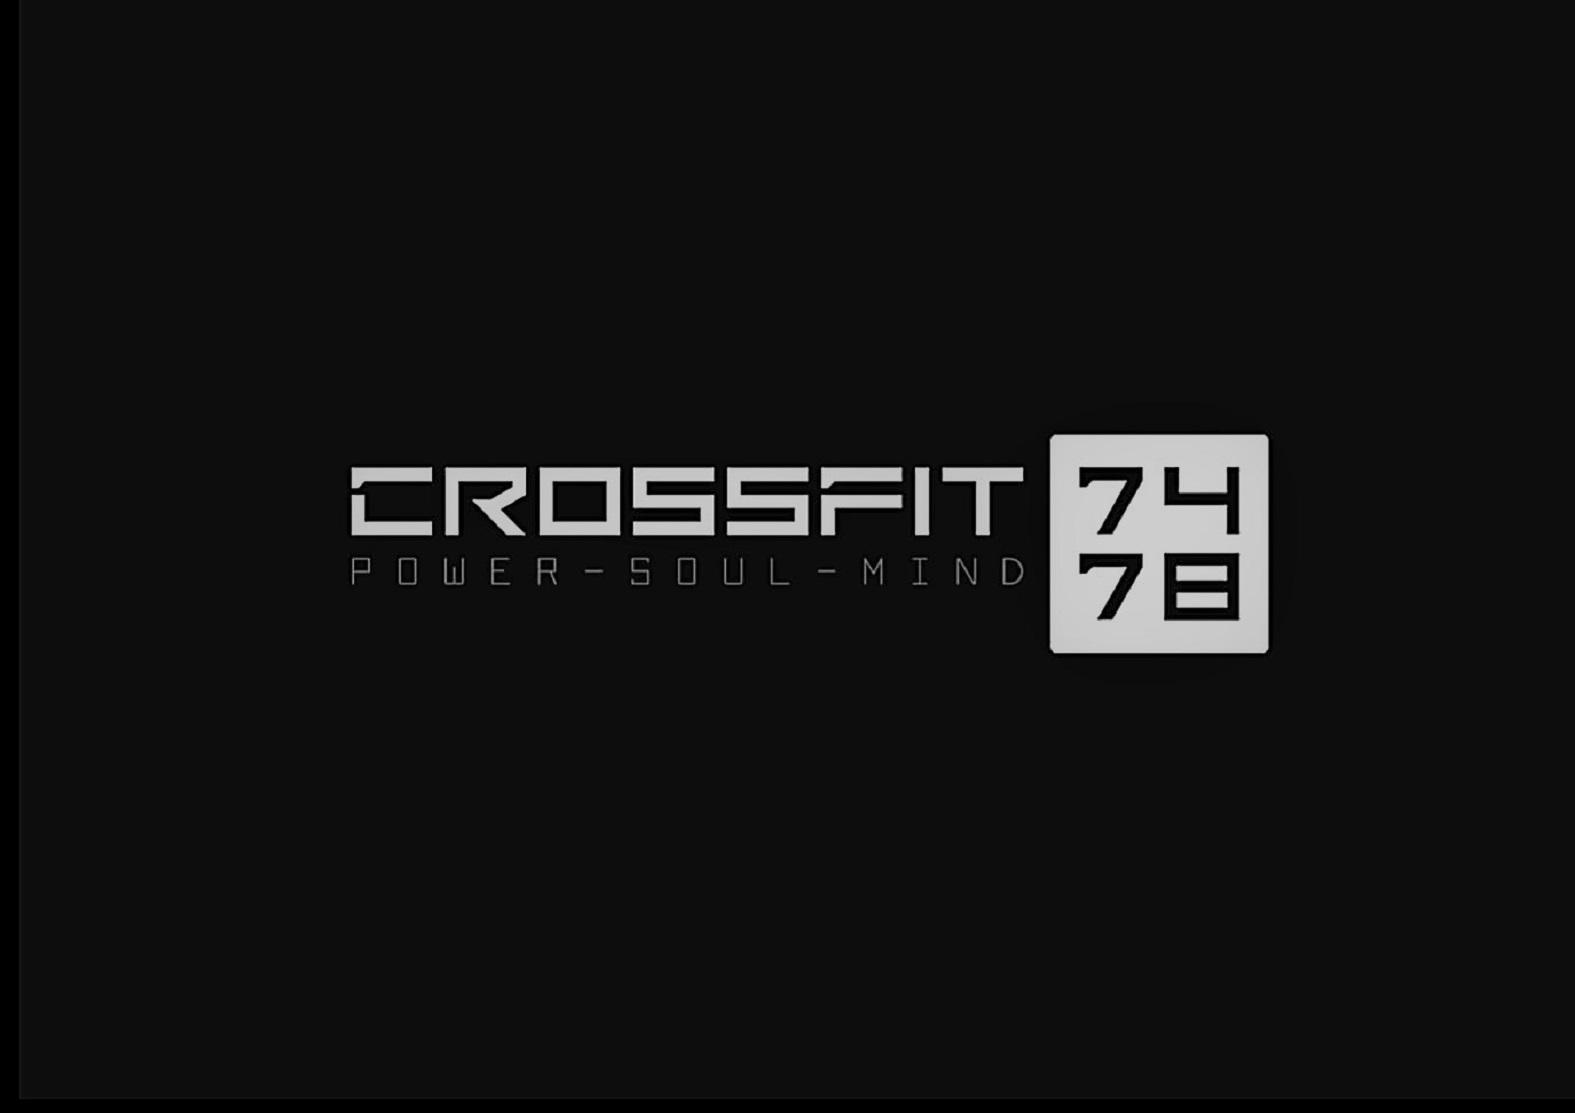 crf 7478